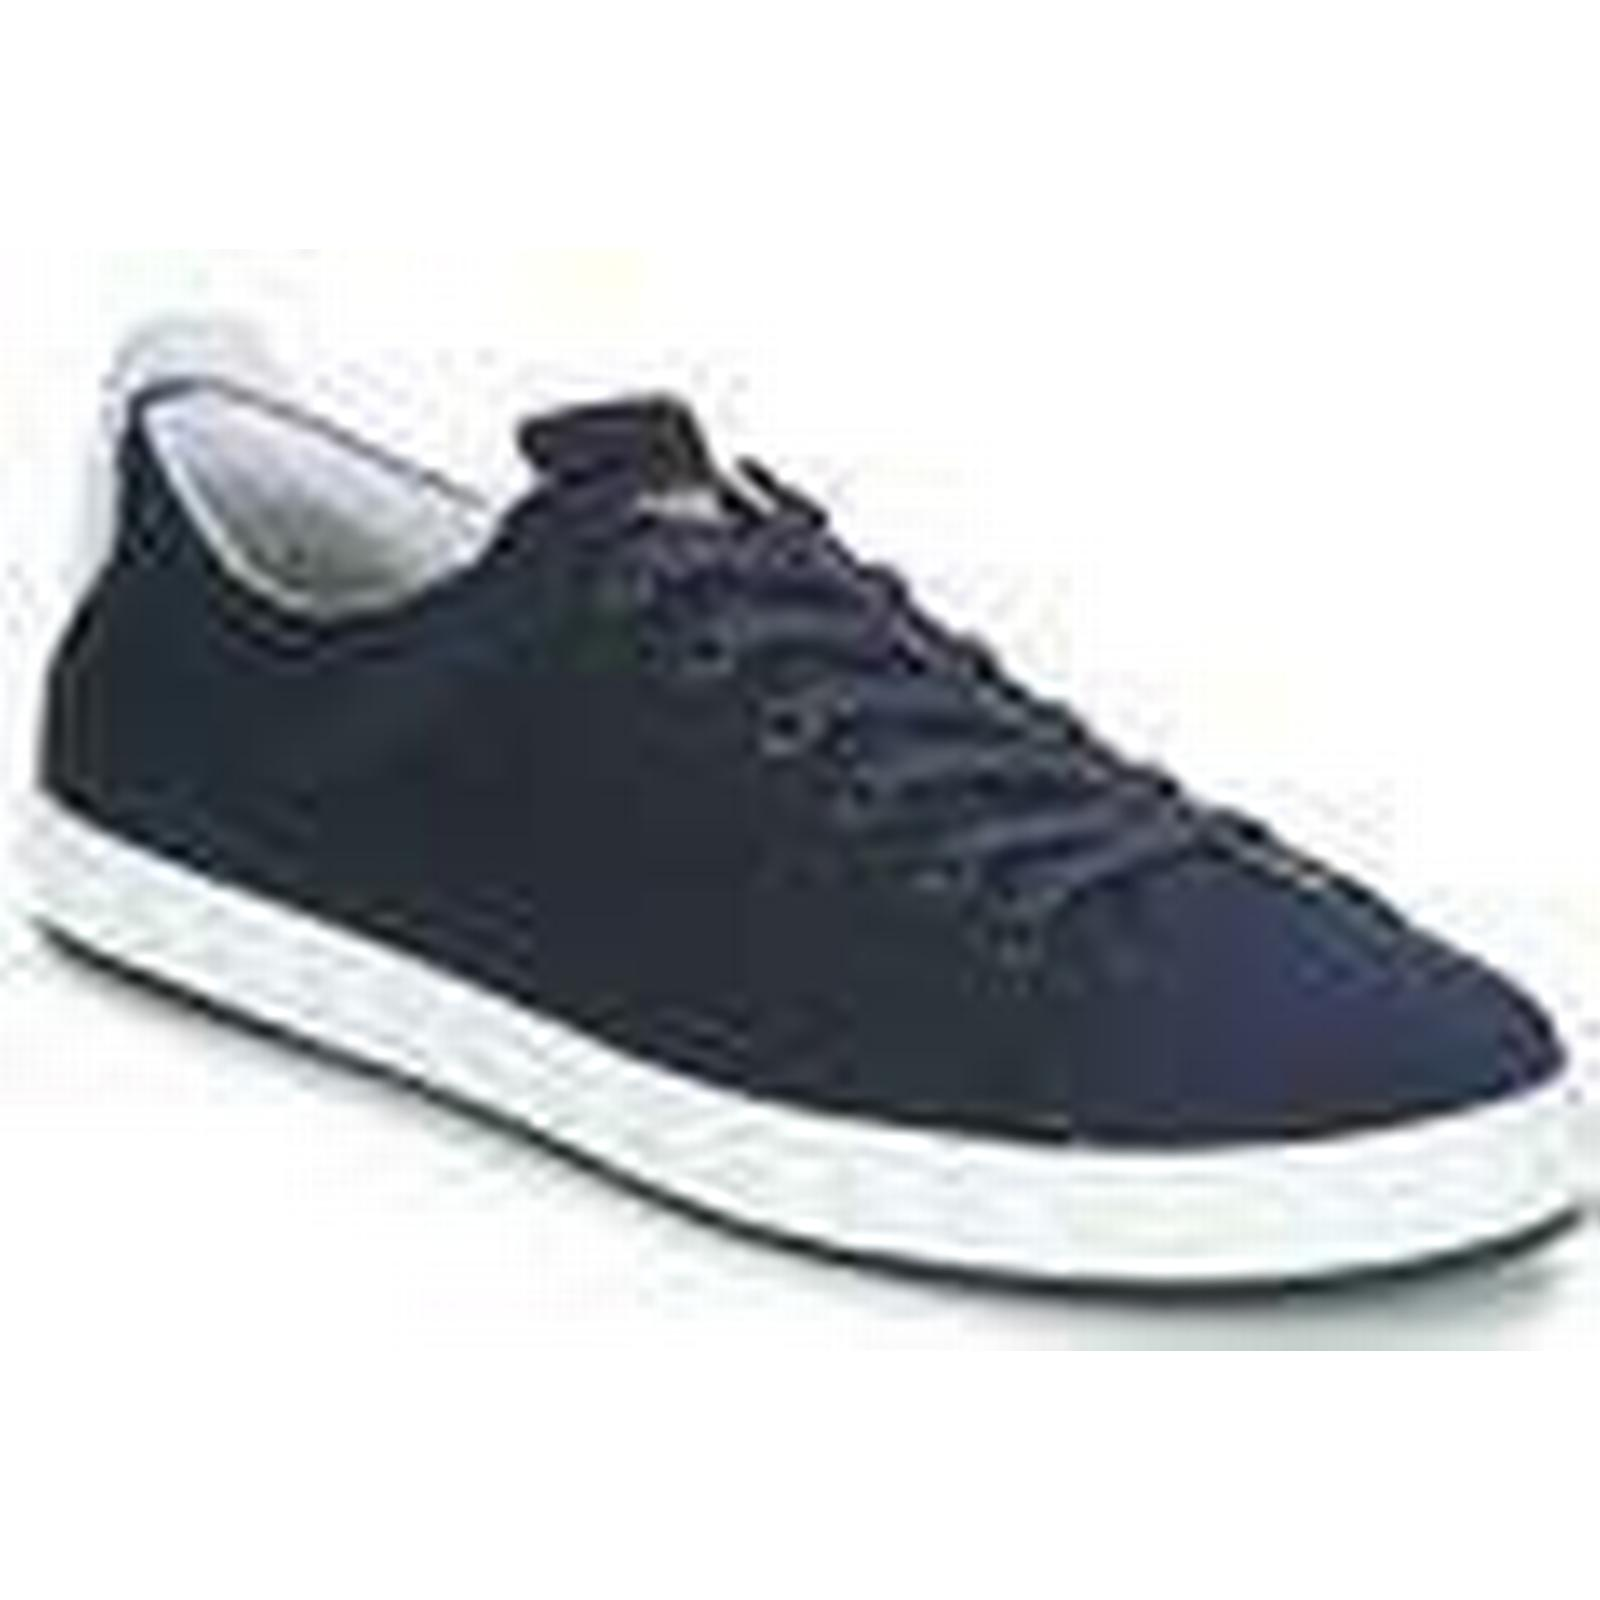 Emporio Armani  ADALBER in  men's Shoes (Trainers) in ADALBER Blue b26d31